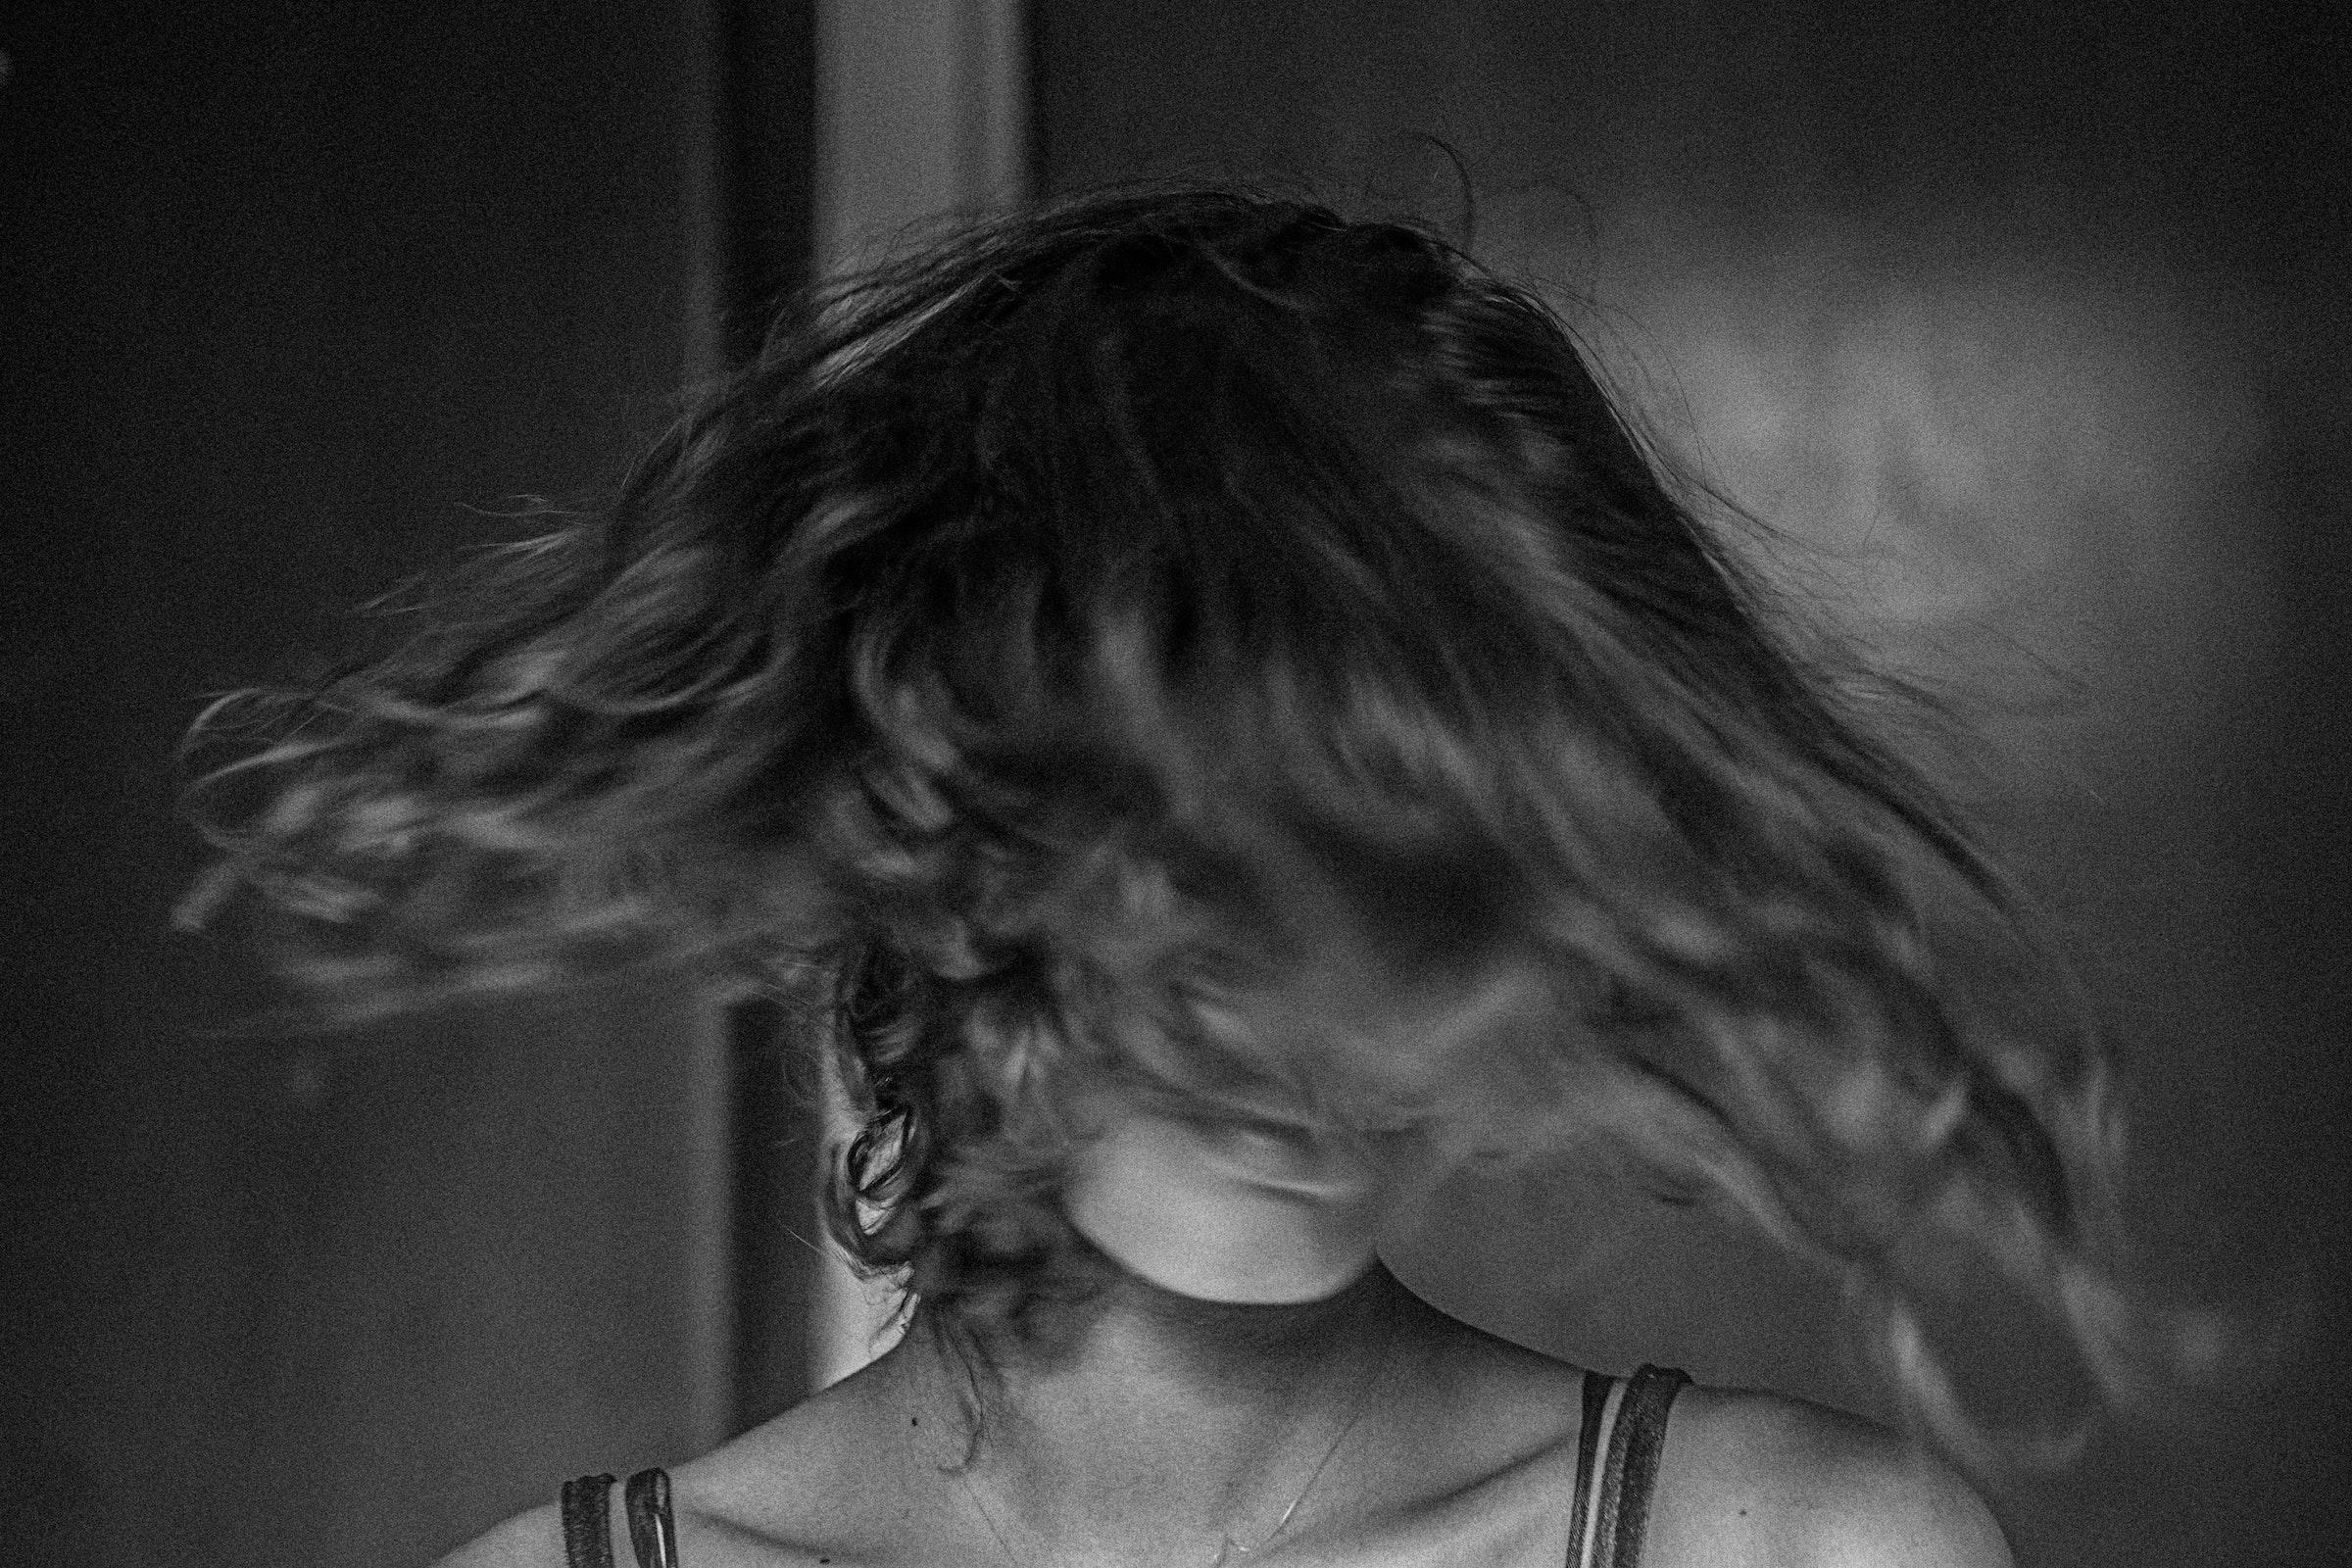 Black and white photo of woman swishing hair.